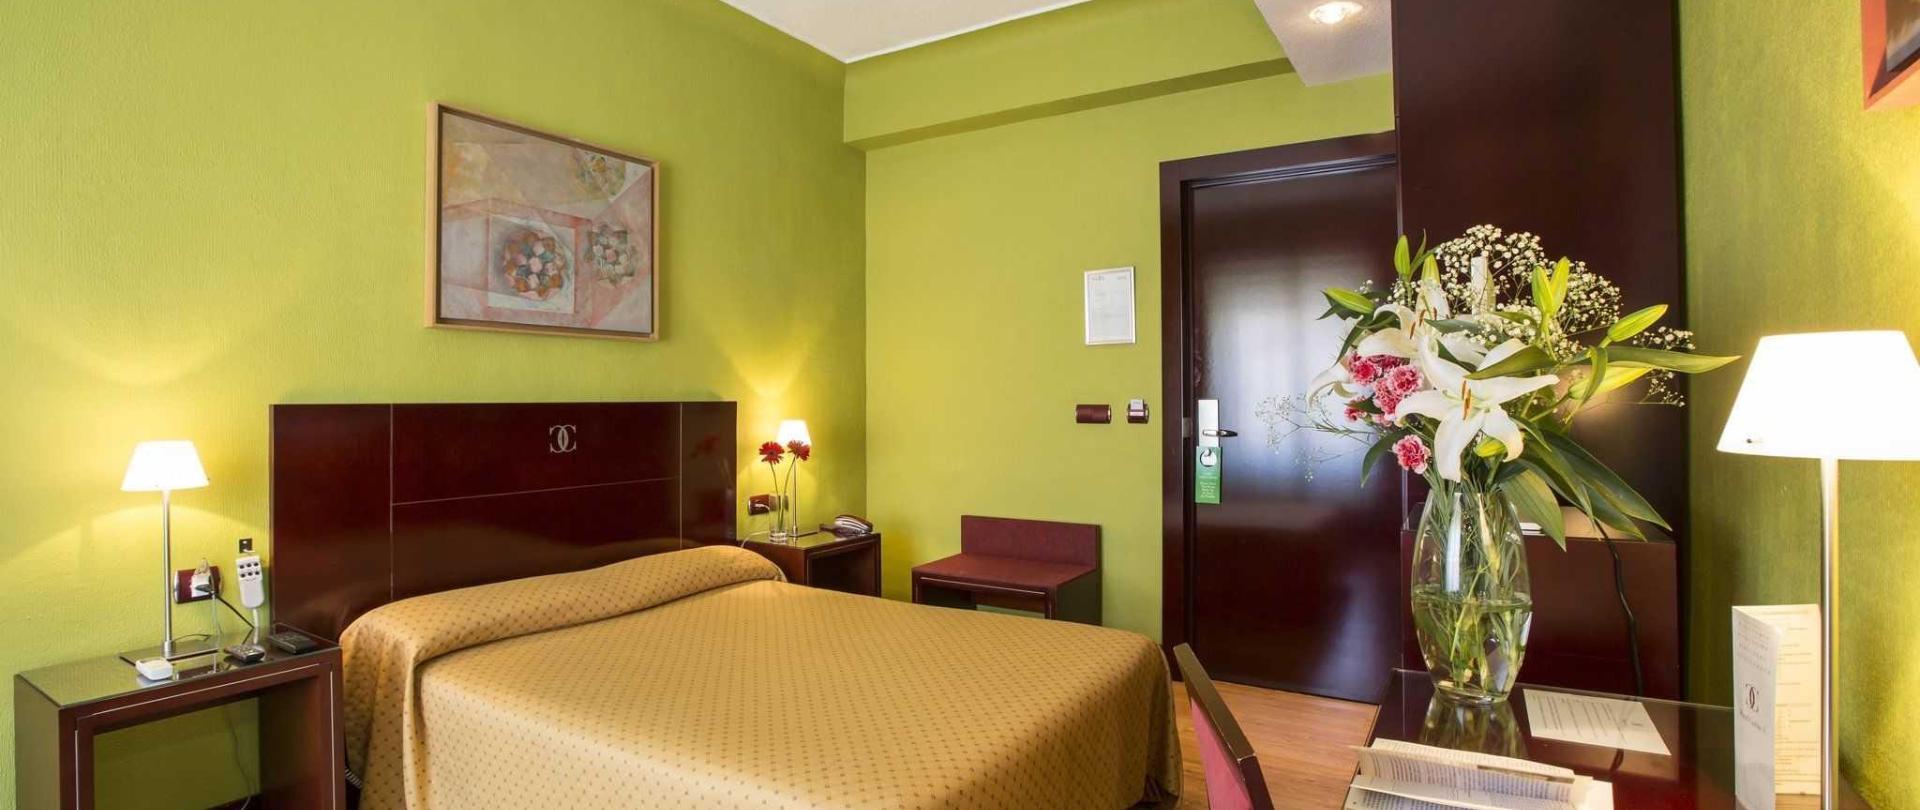 hotel-carlos-v-9803-428.jpg